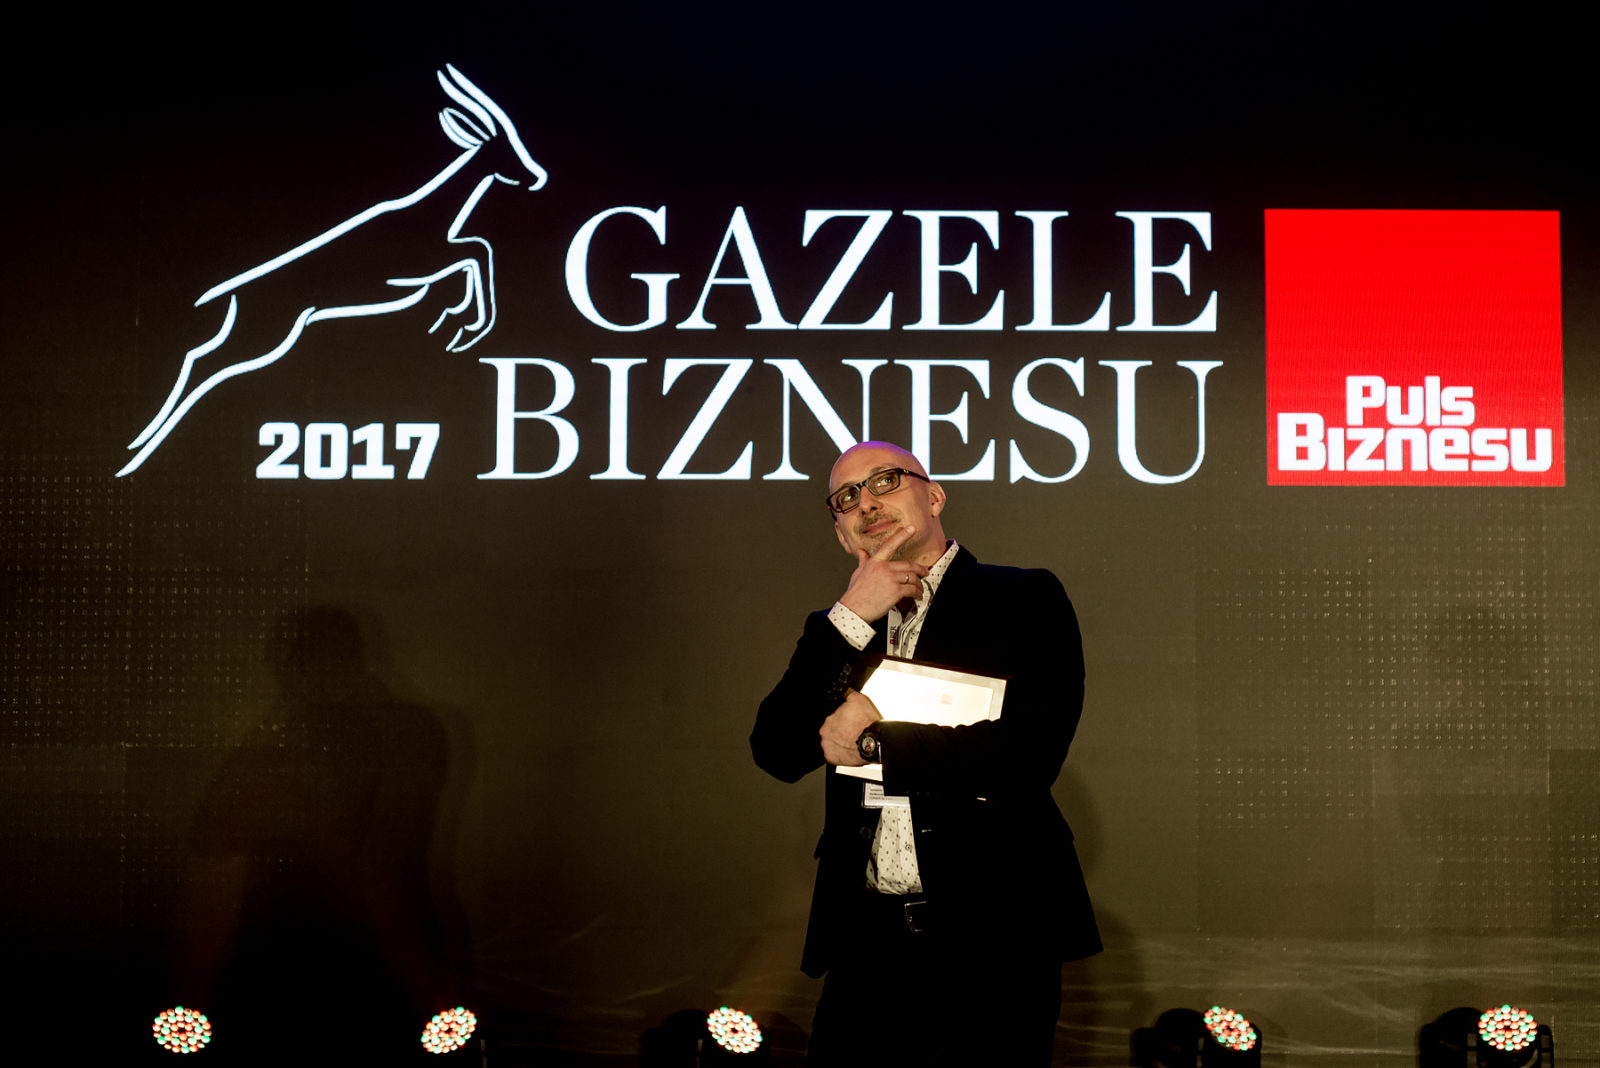 gazela biznesu Forner